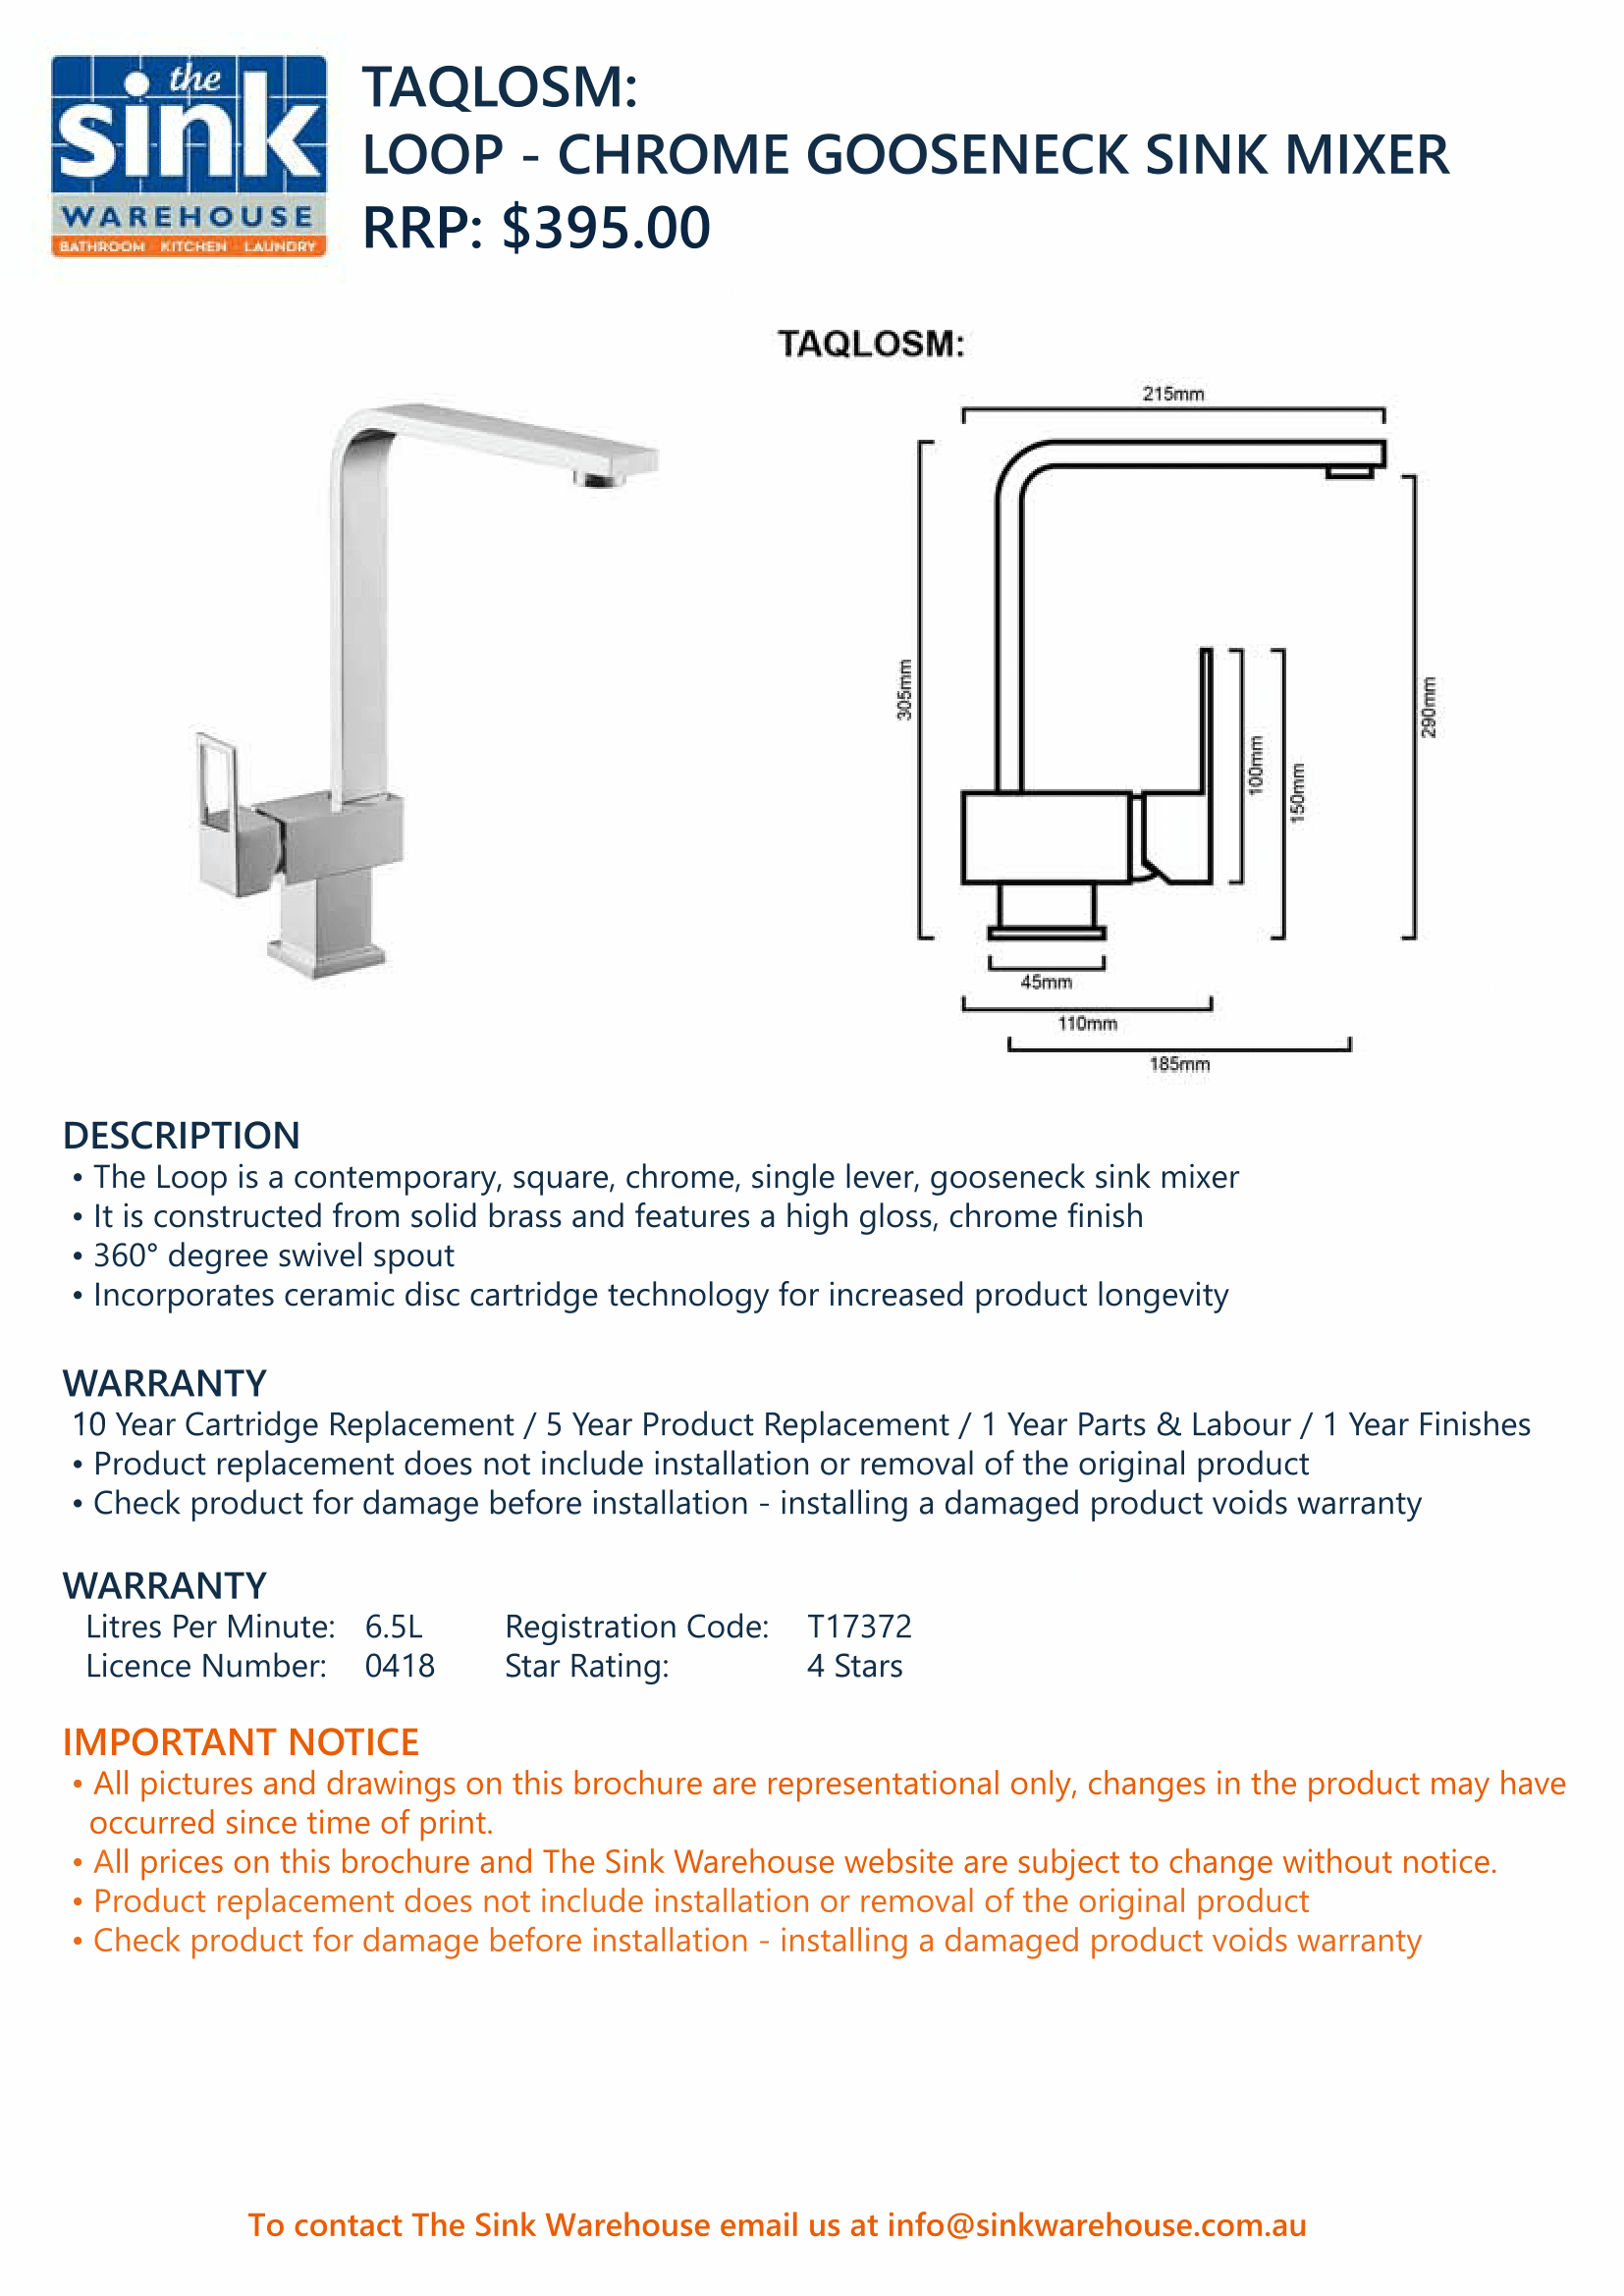 taqlosm-product-spec-sheet-1.png